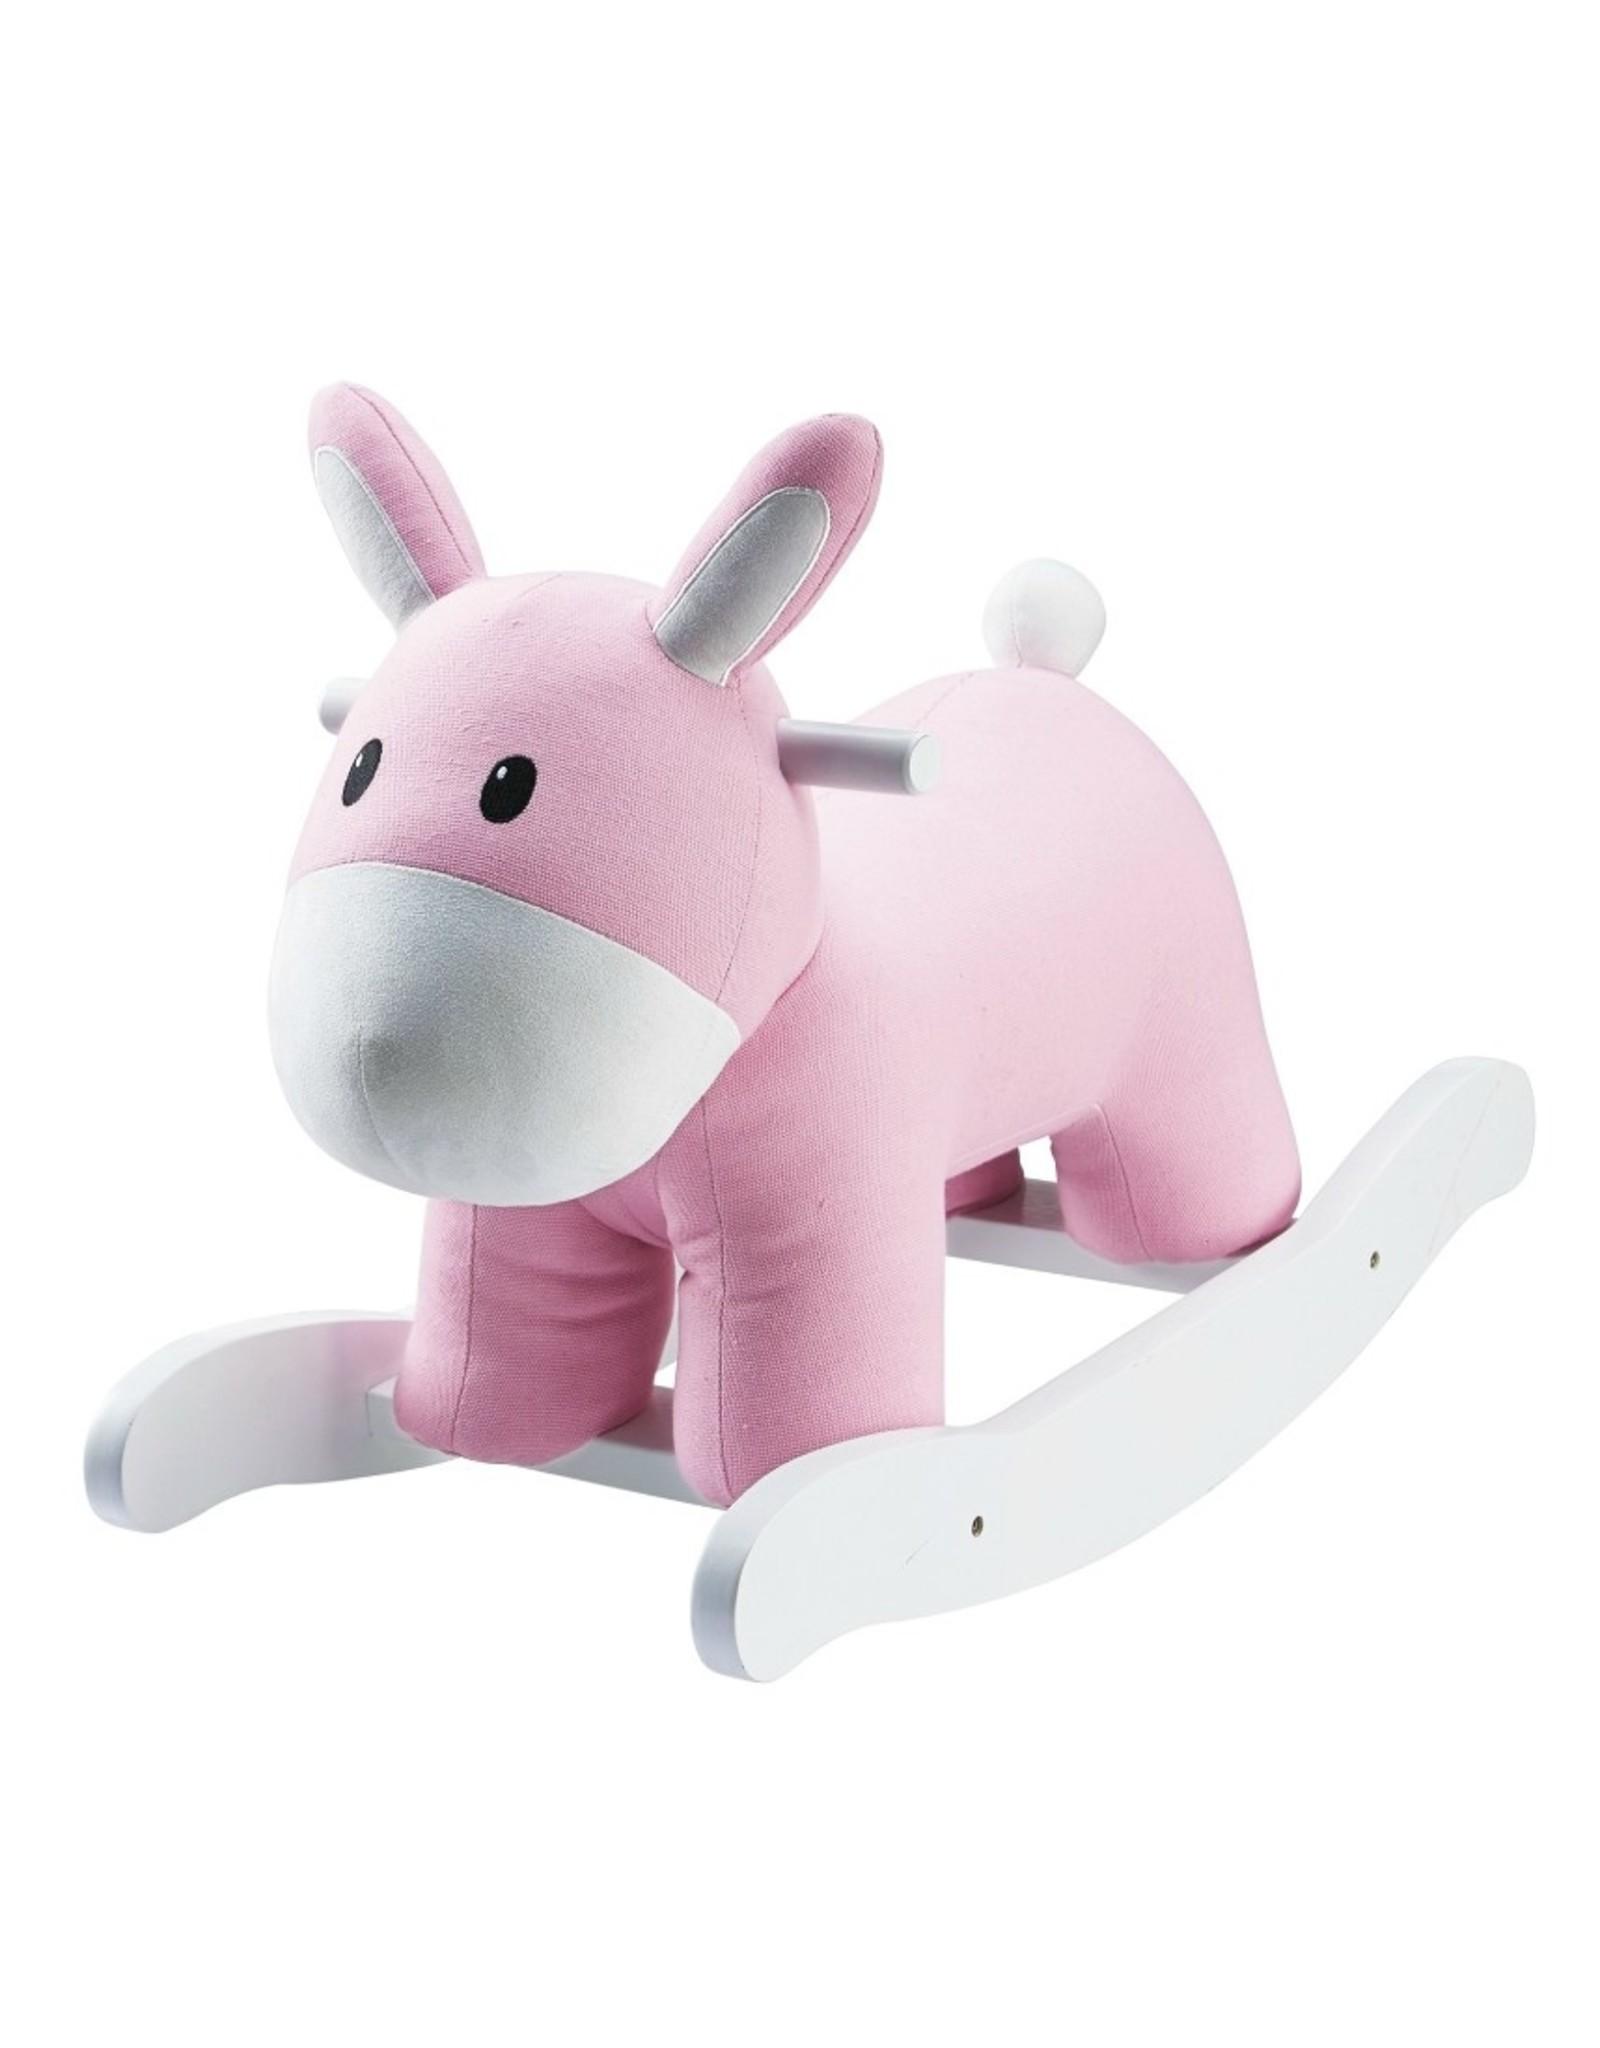 Kid's Concept Kid's Concept - ROCKING HORSE - ROSE